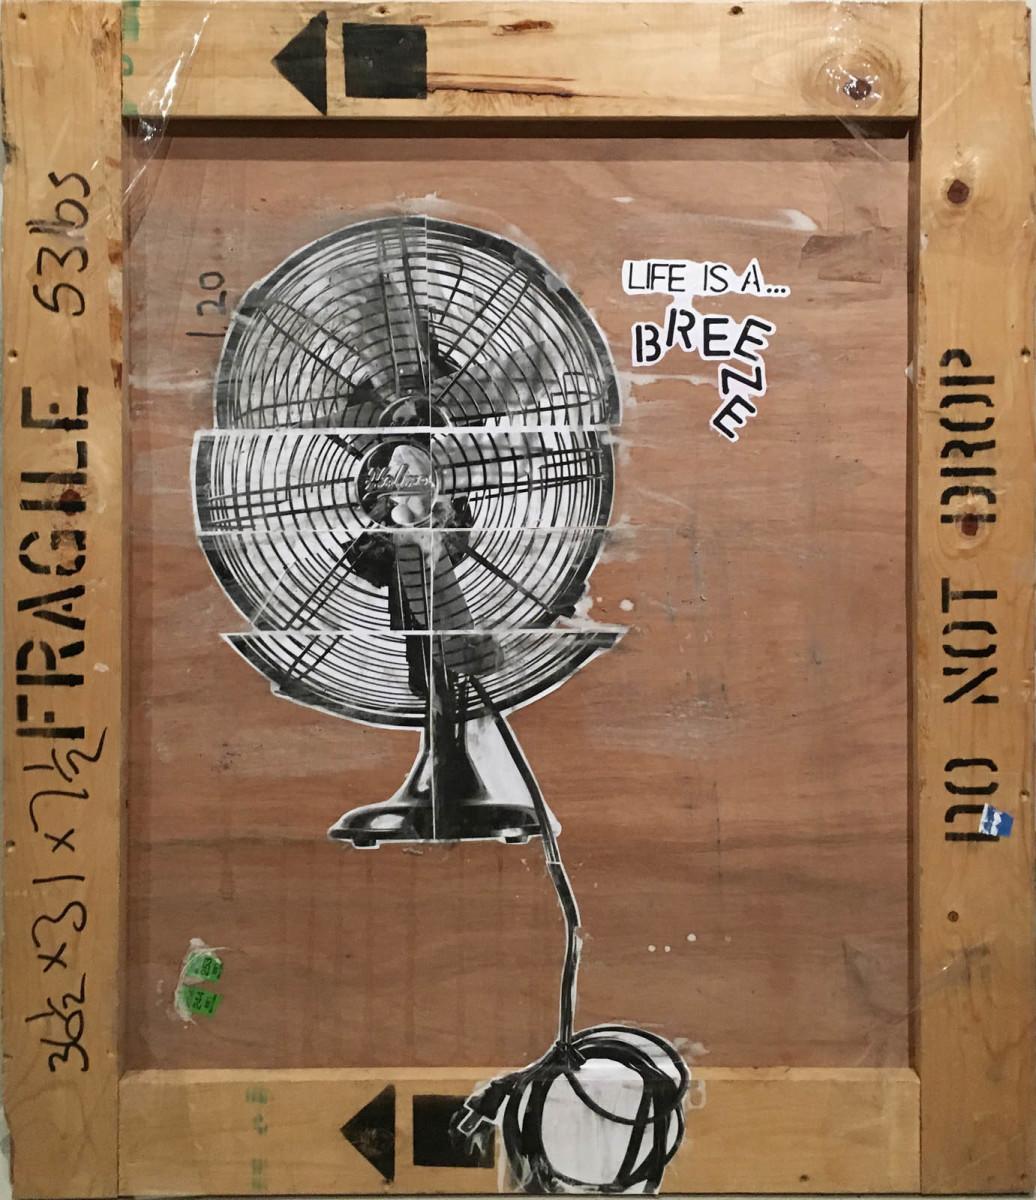 Life is a Breeze (Fan) on Crate